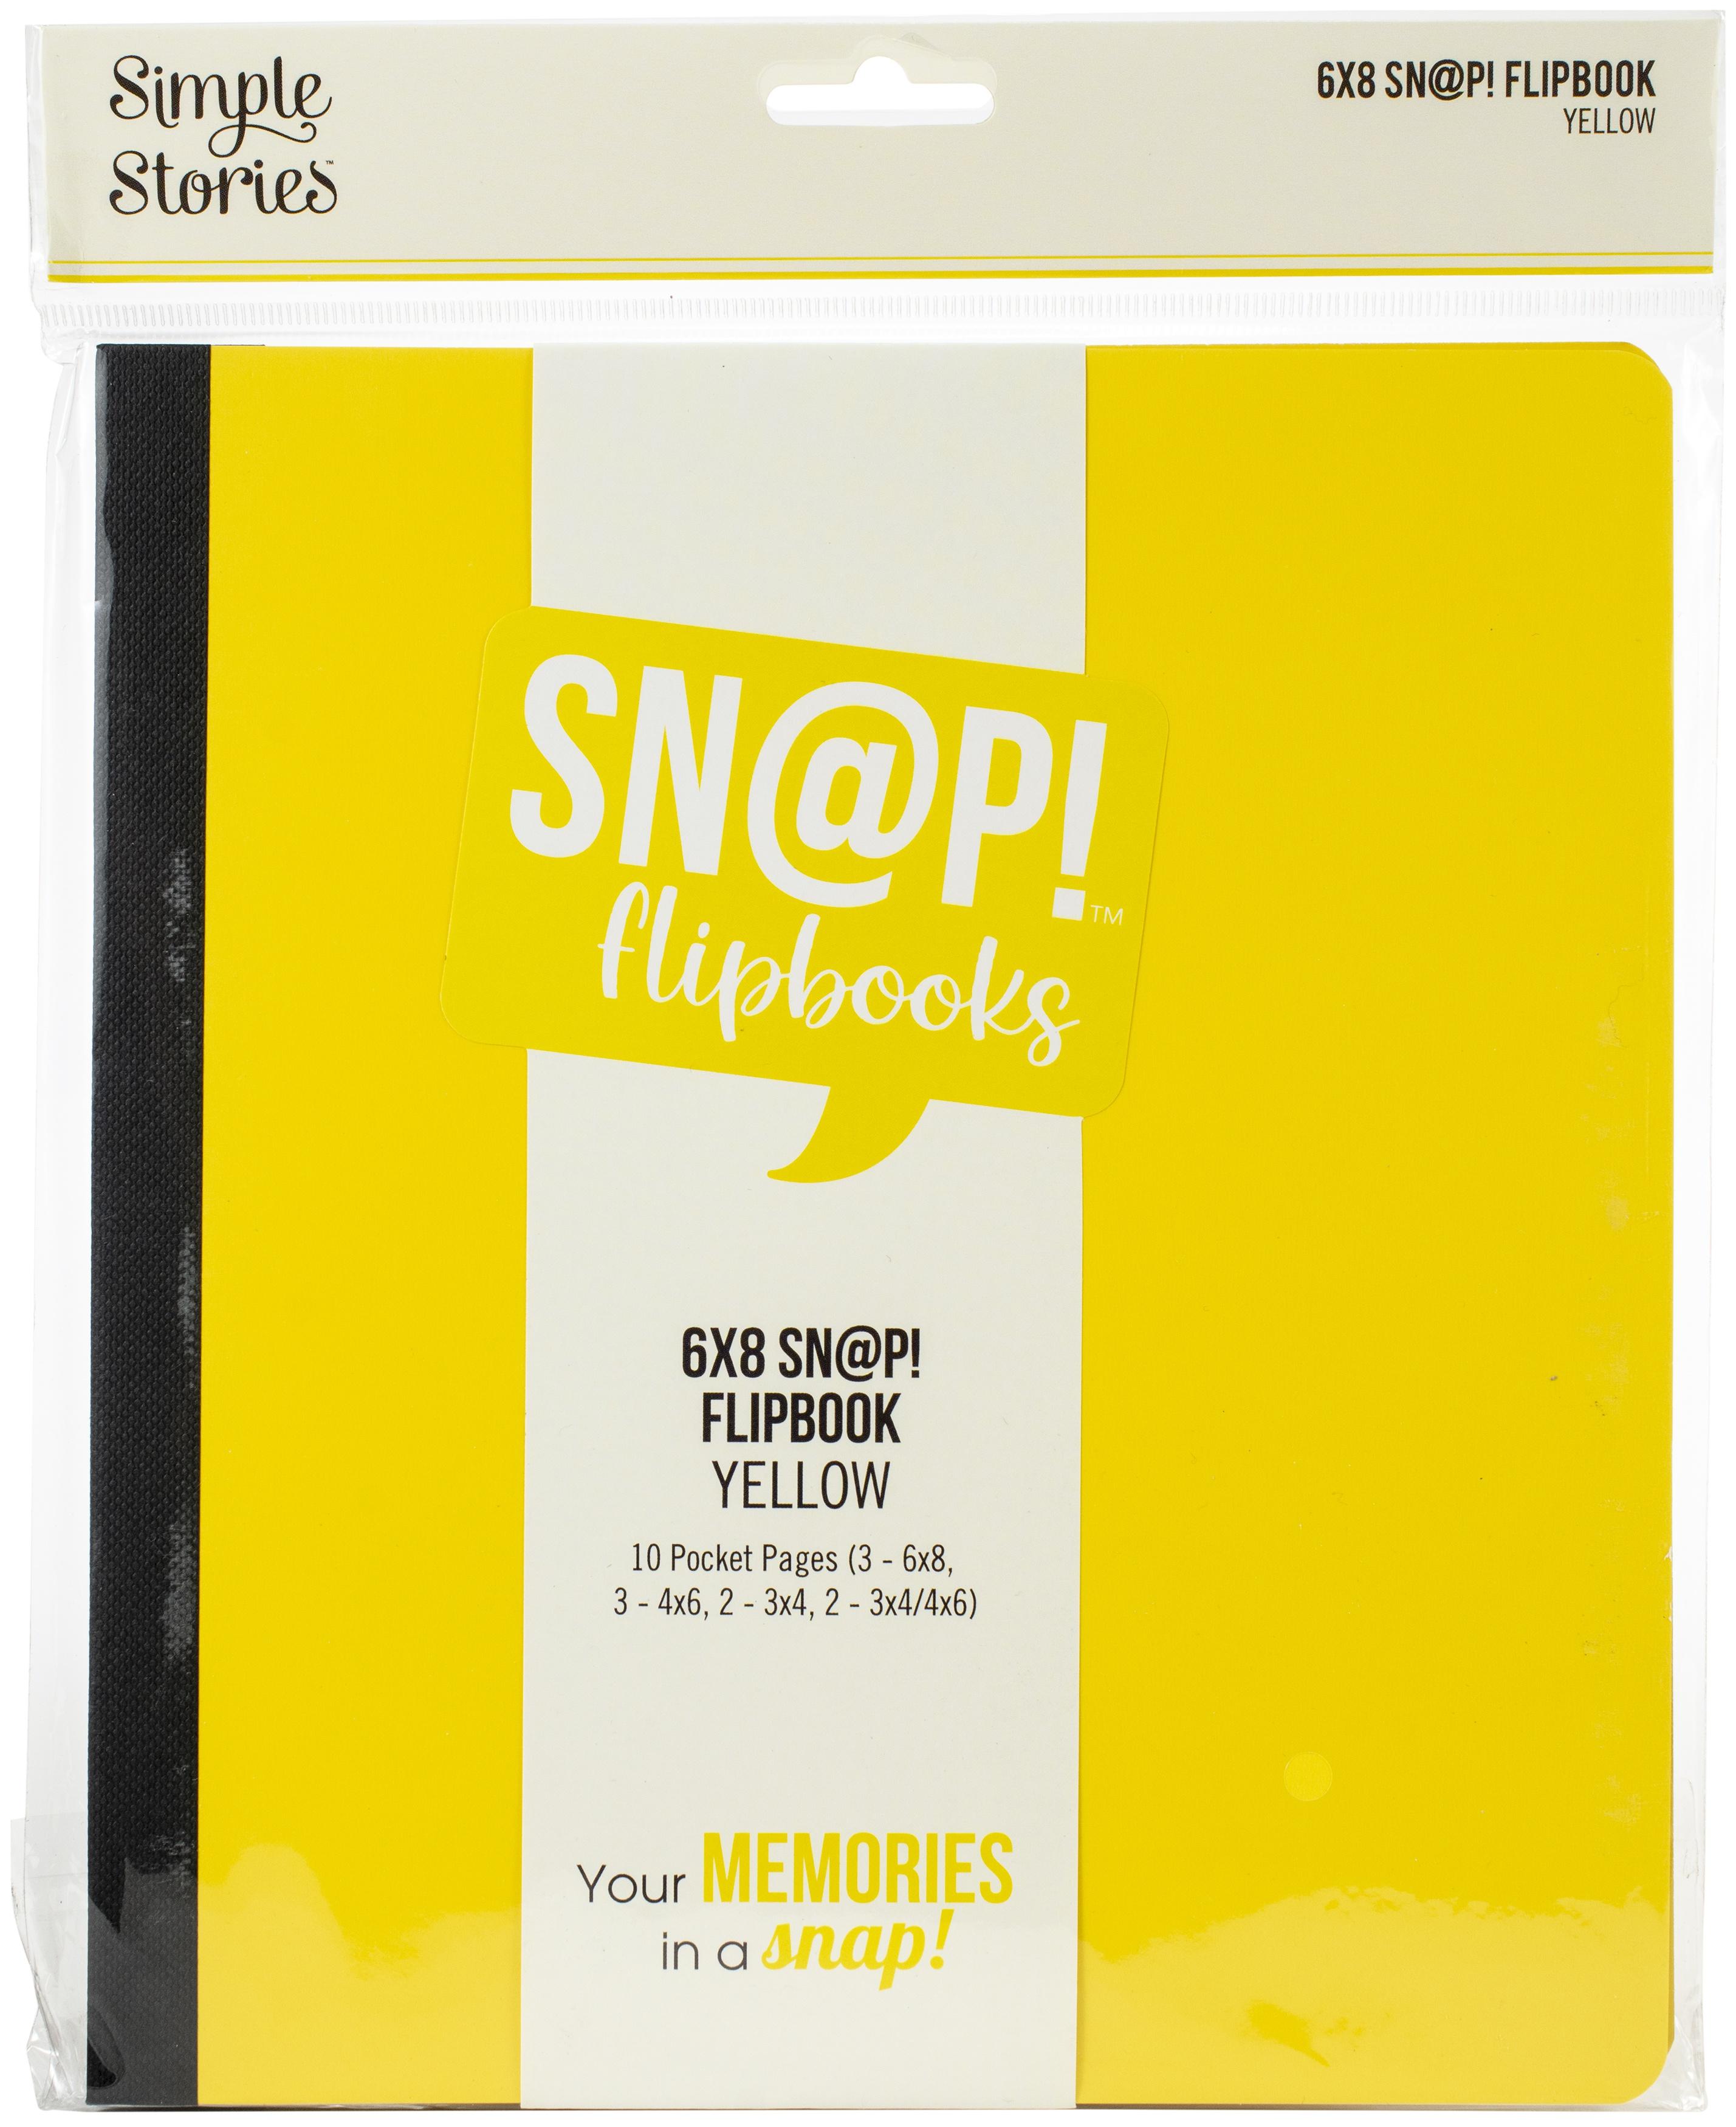 Simple Stories Sn@p! Flipbook 6X8-Yellow